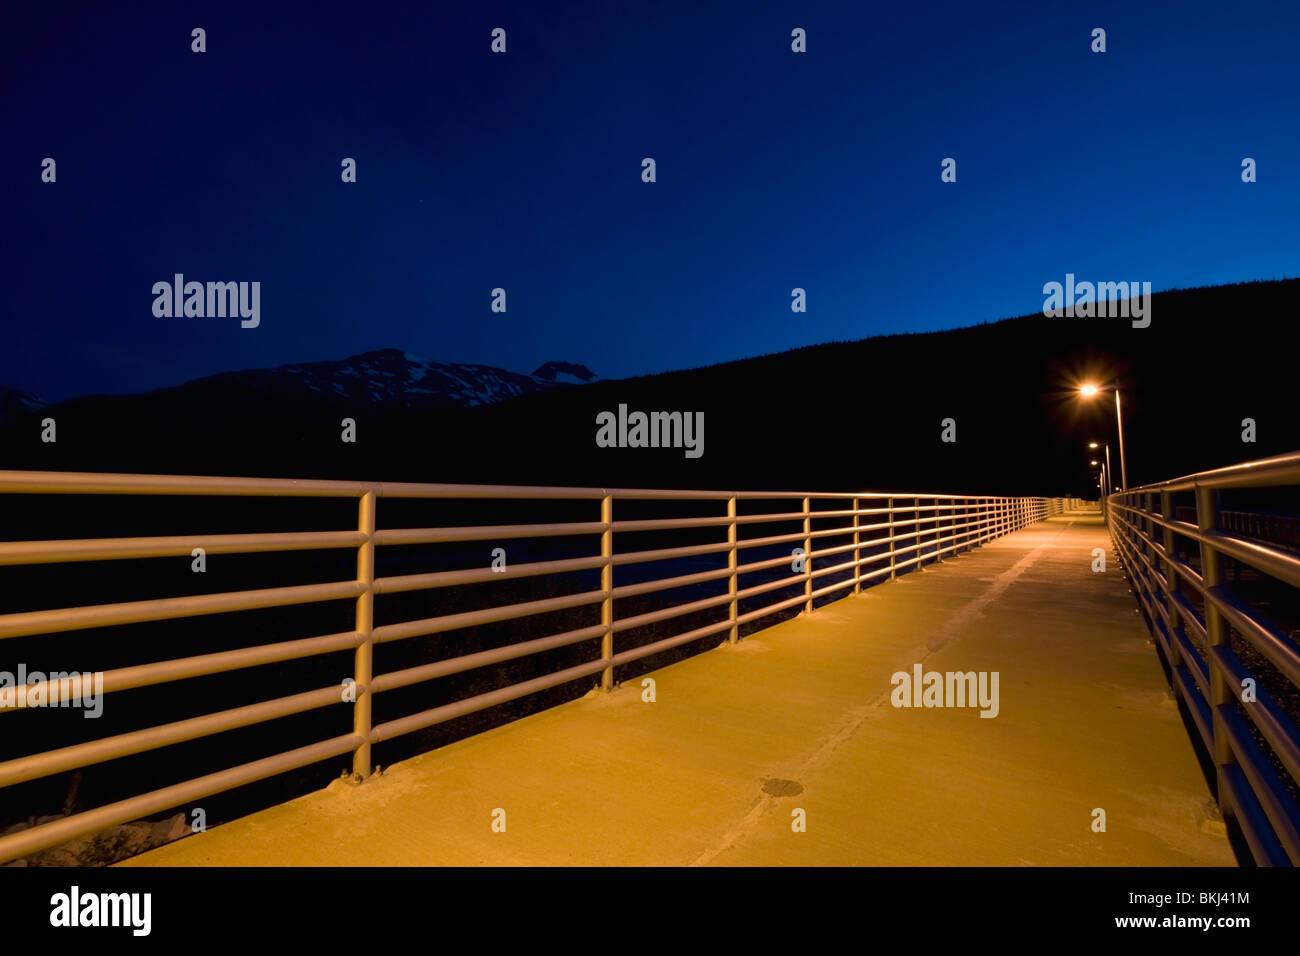 Taiya Inlet, Skagway, Alaska, United States Of America; Pat Moore Bridge Flooded With Lights At Night - Stock Image